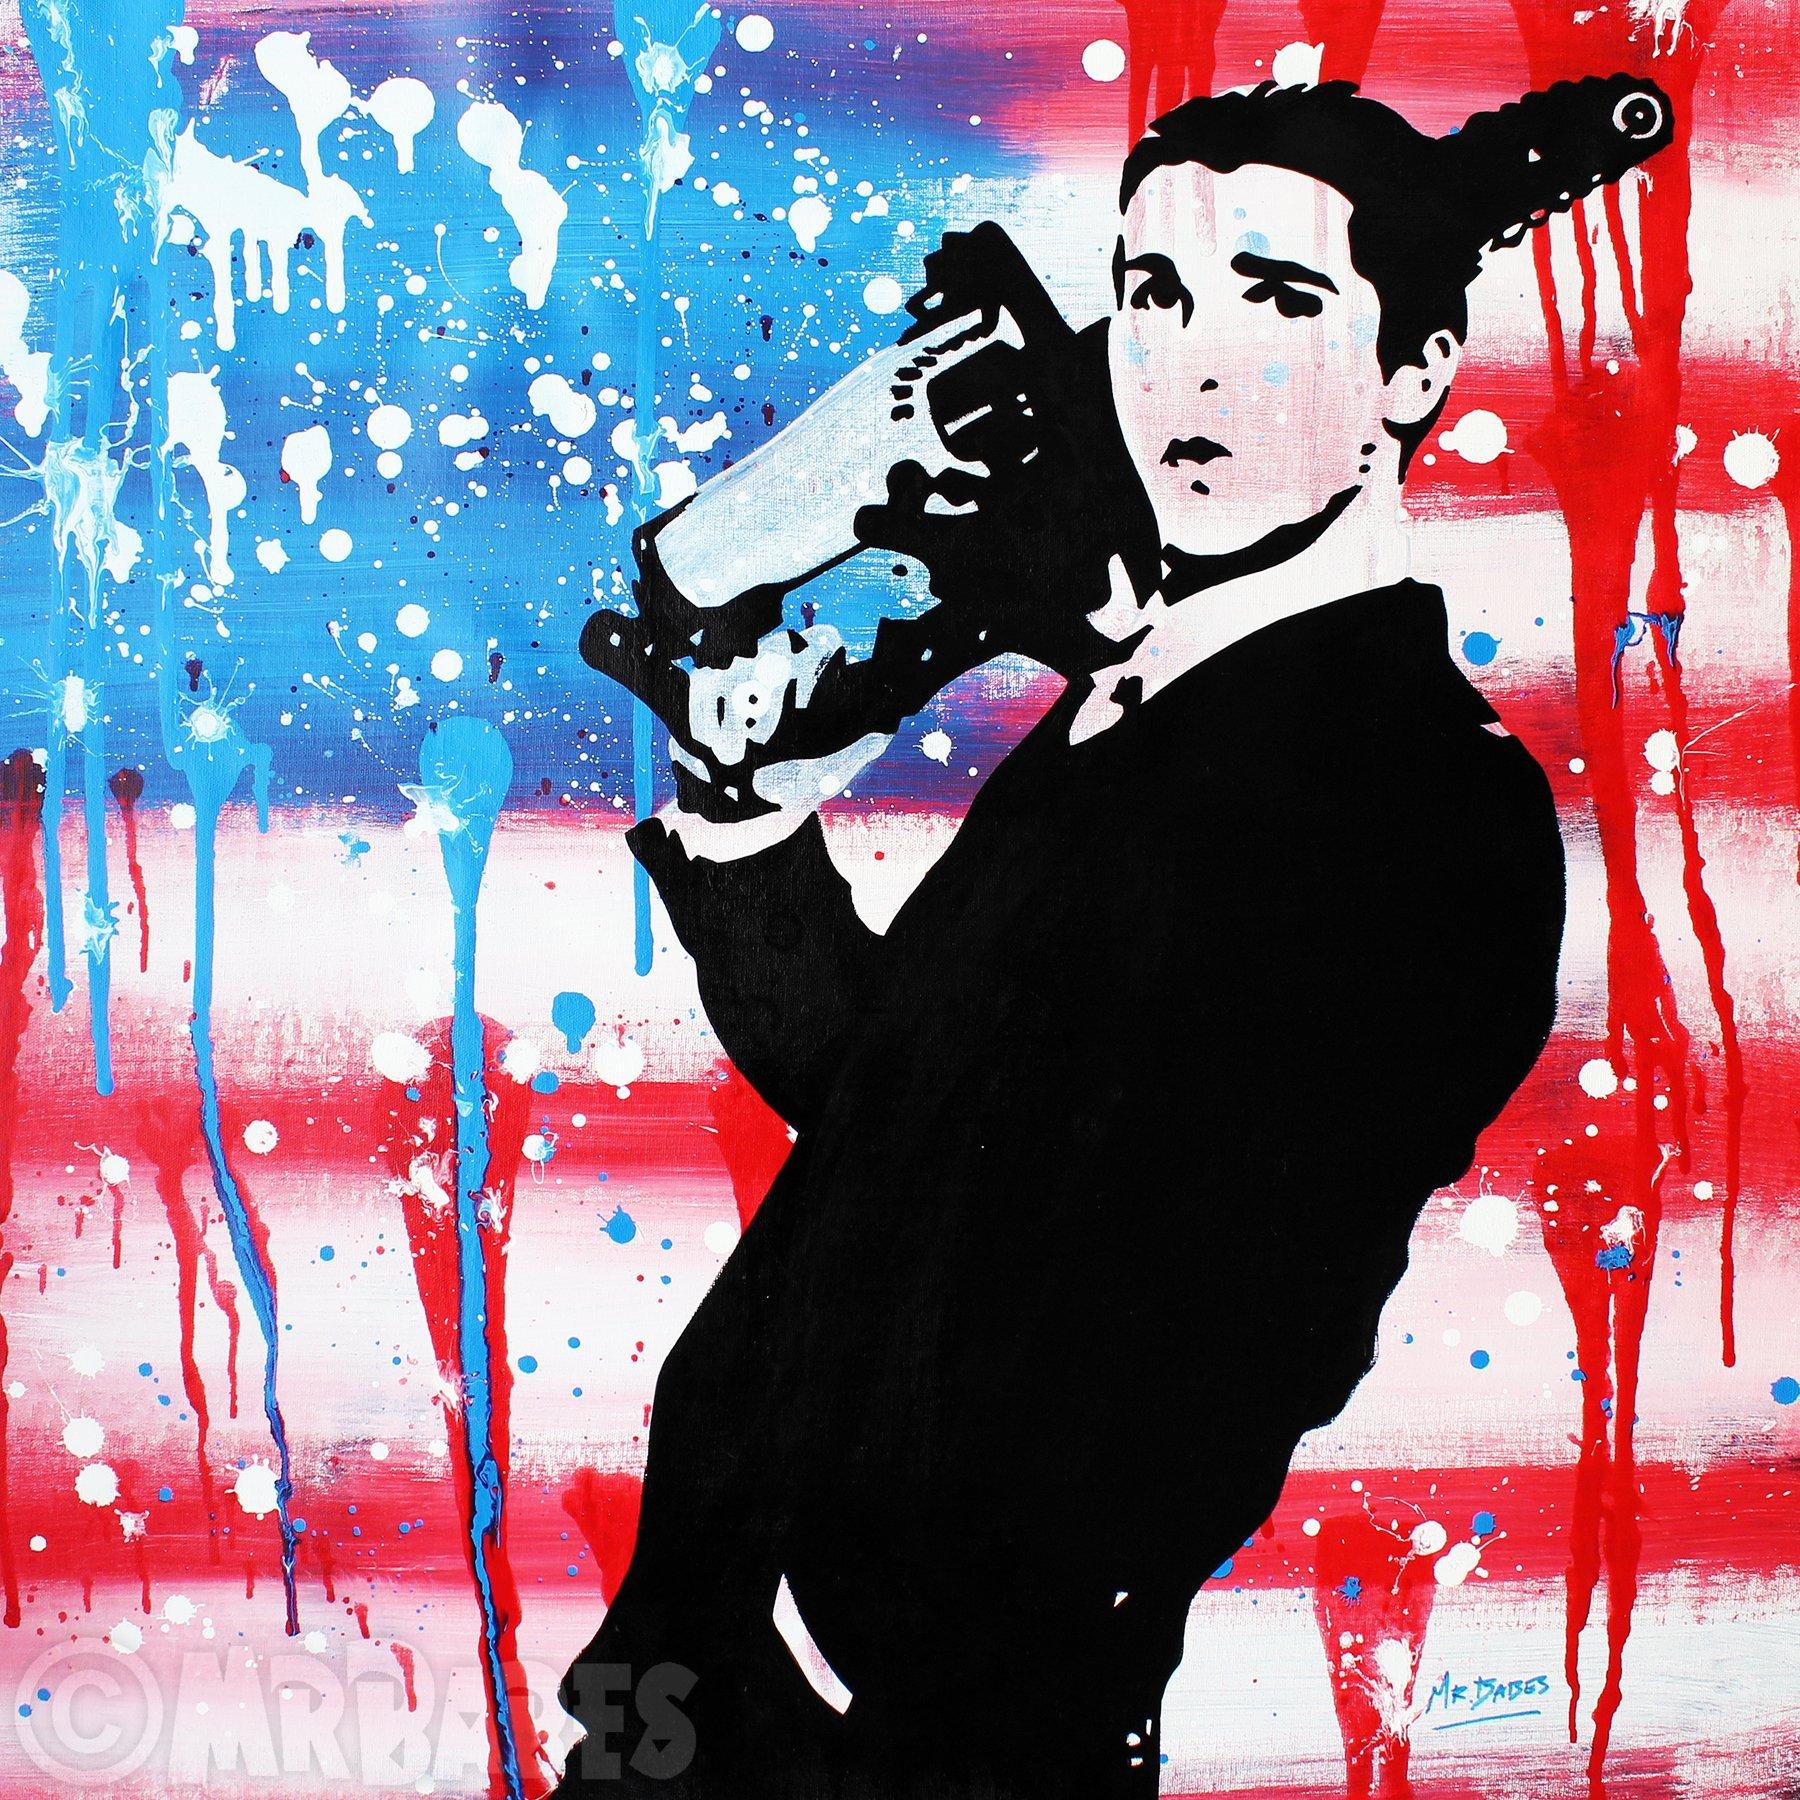 MR.BABES - ''American Psycho: Patrick Bateman (Christian Bale)'' - Original Pop Art Painting - Movie Portrait by MR.BABES